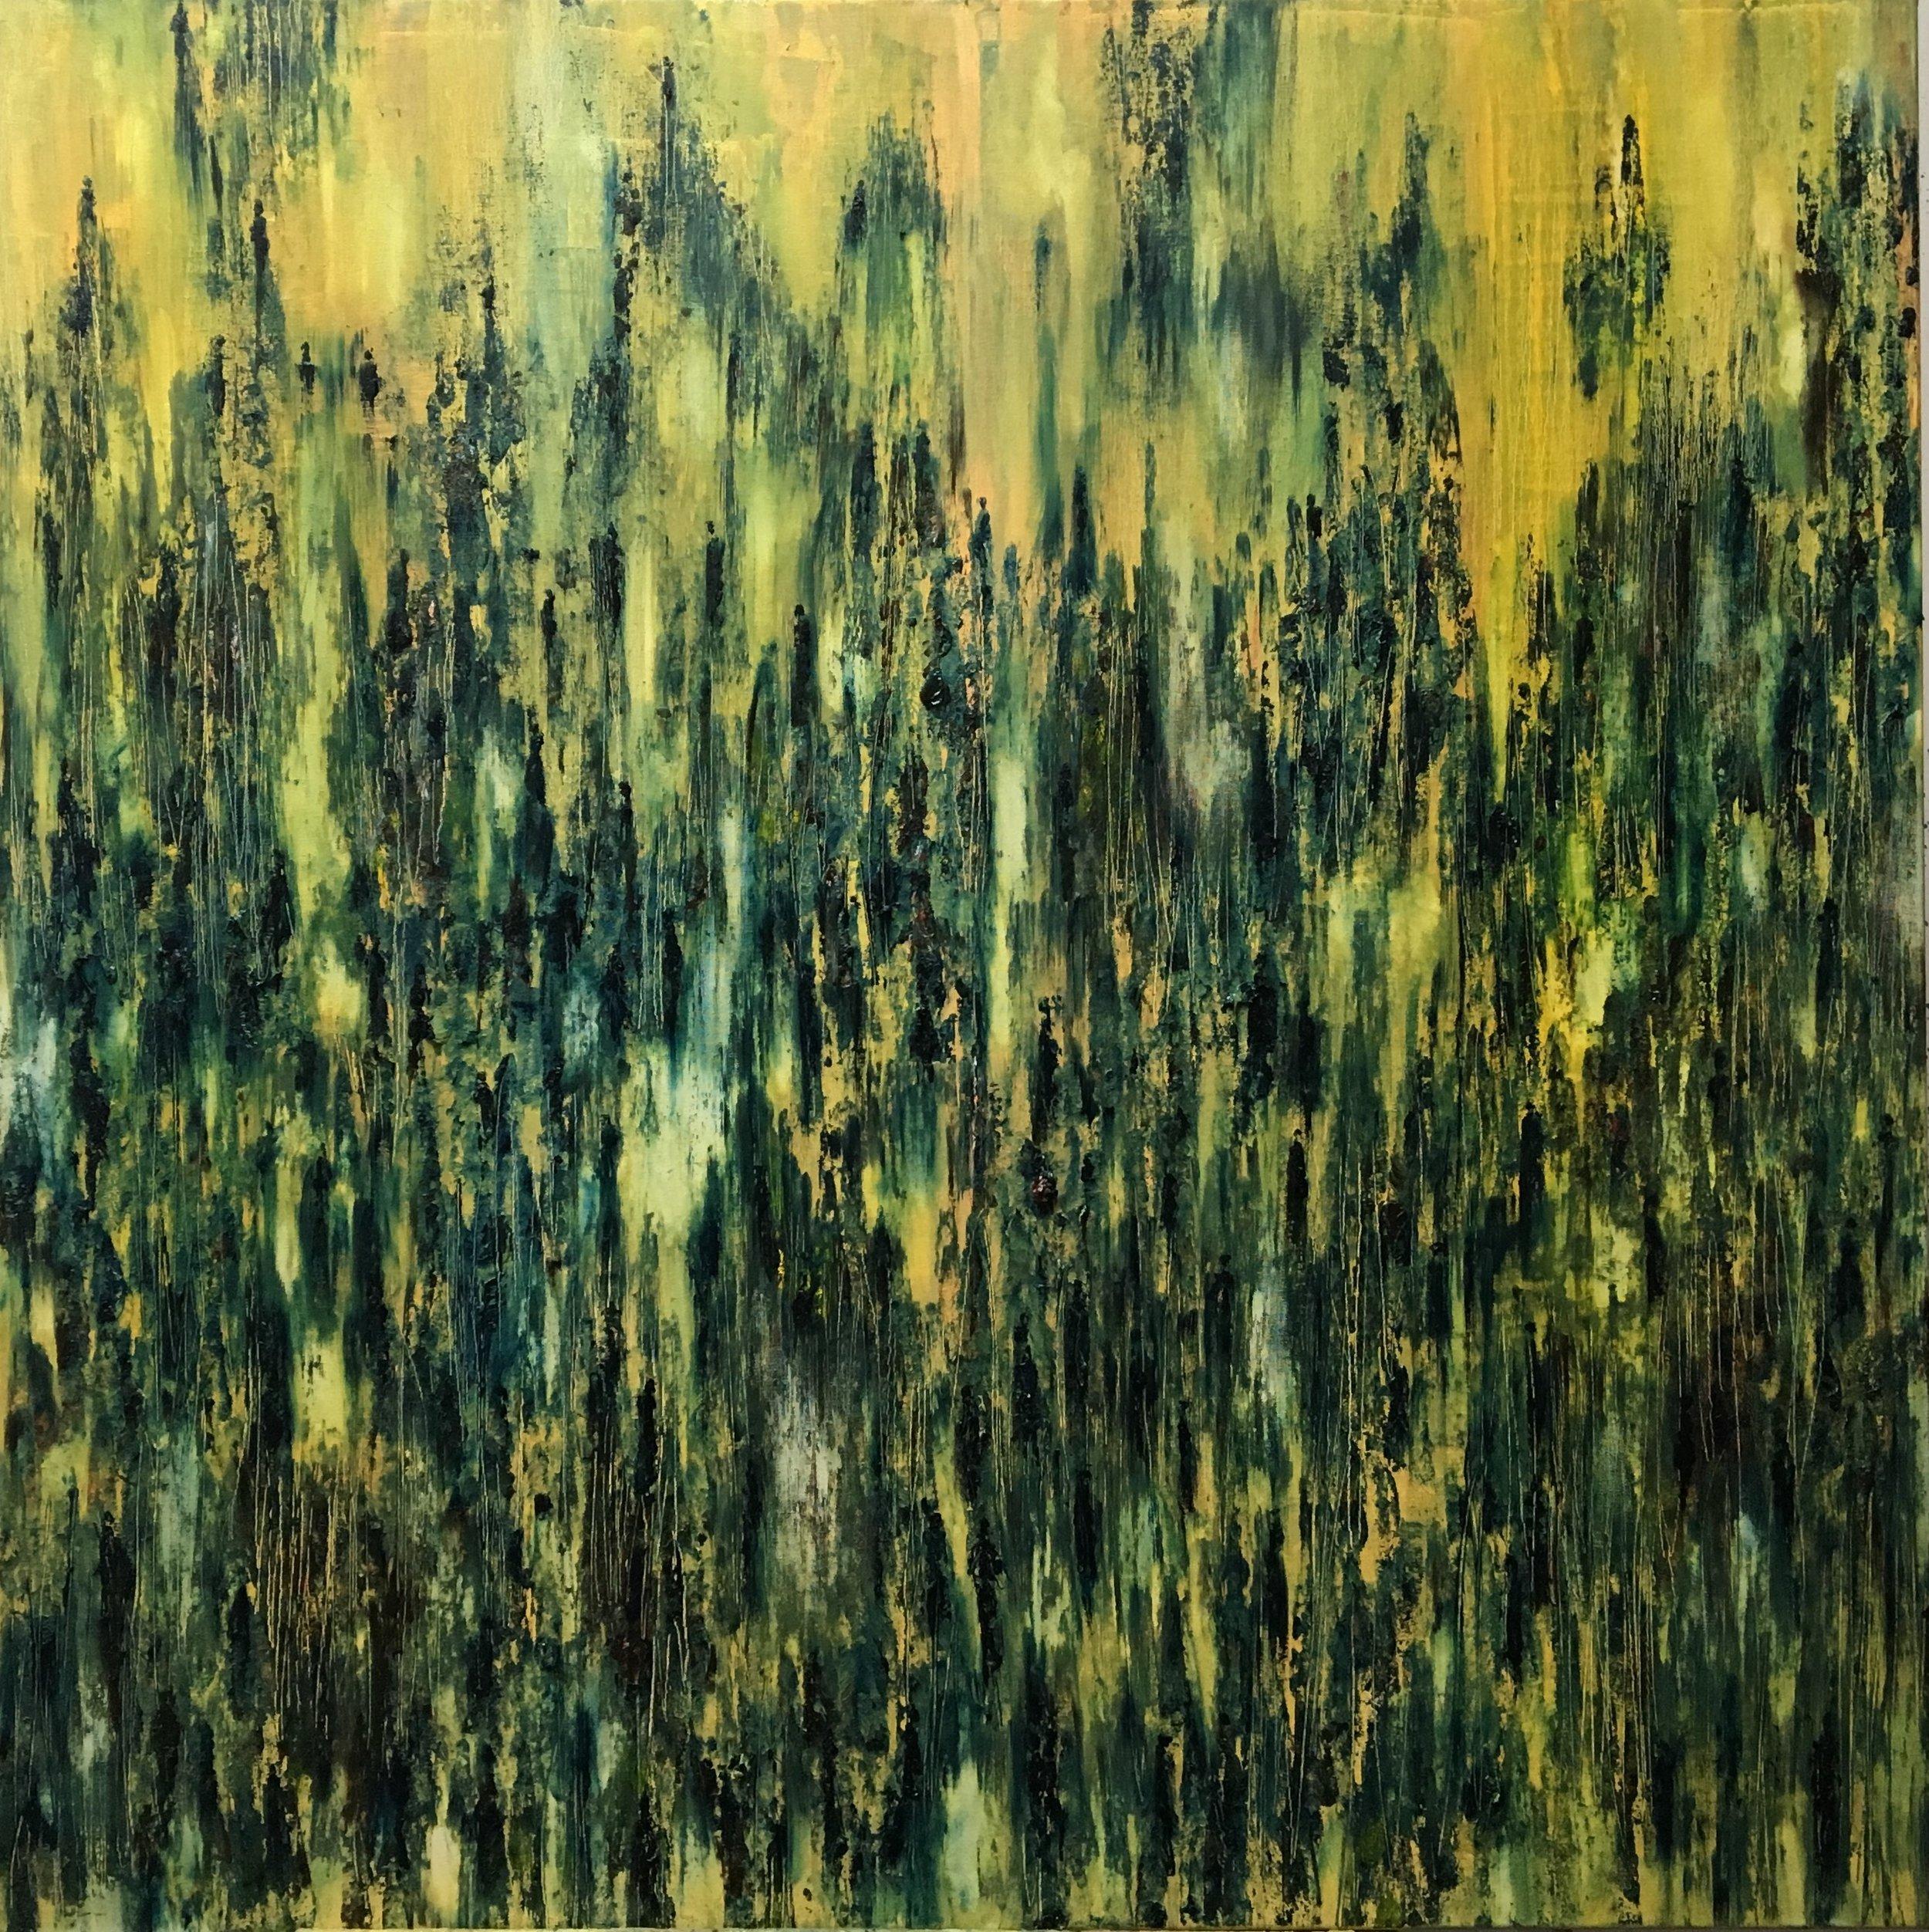 Shadows, Oil, 40 * 40 inches, 2016